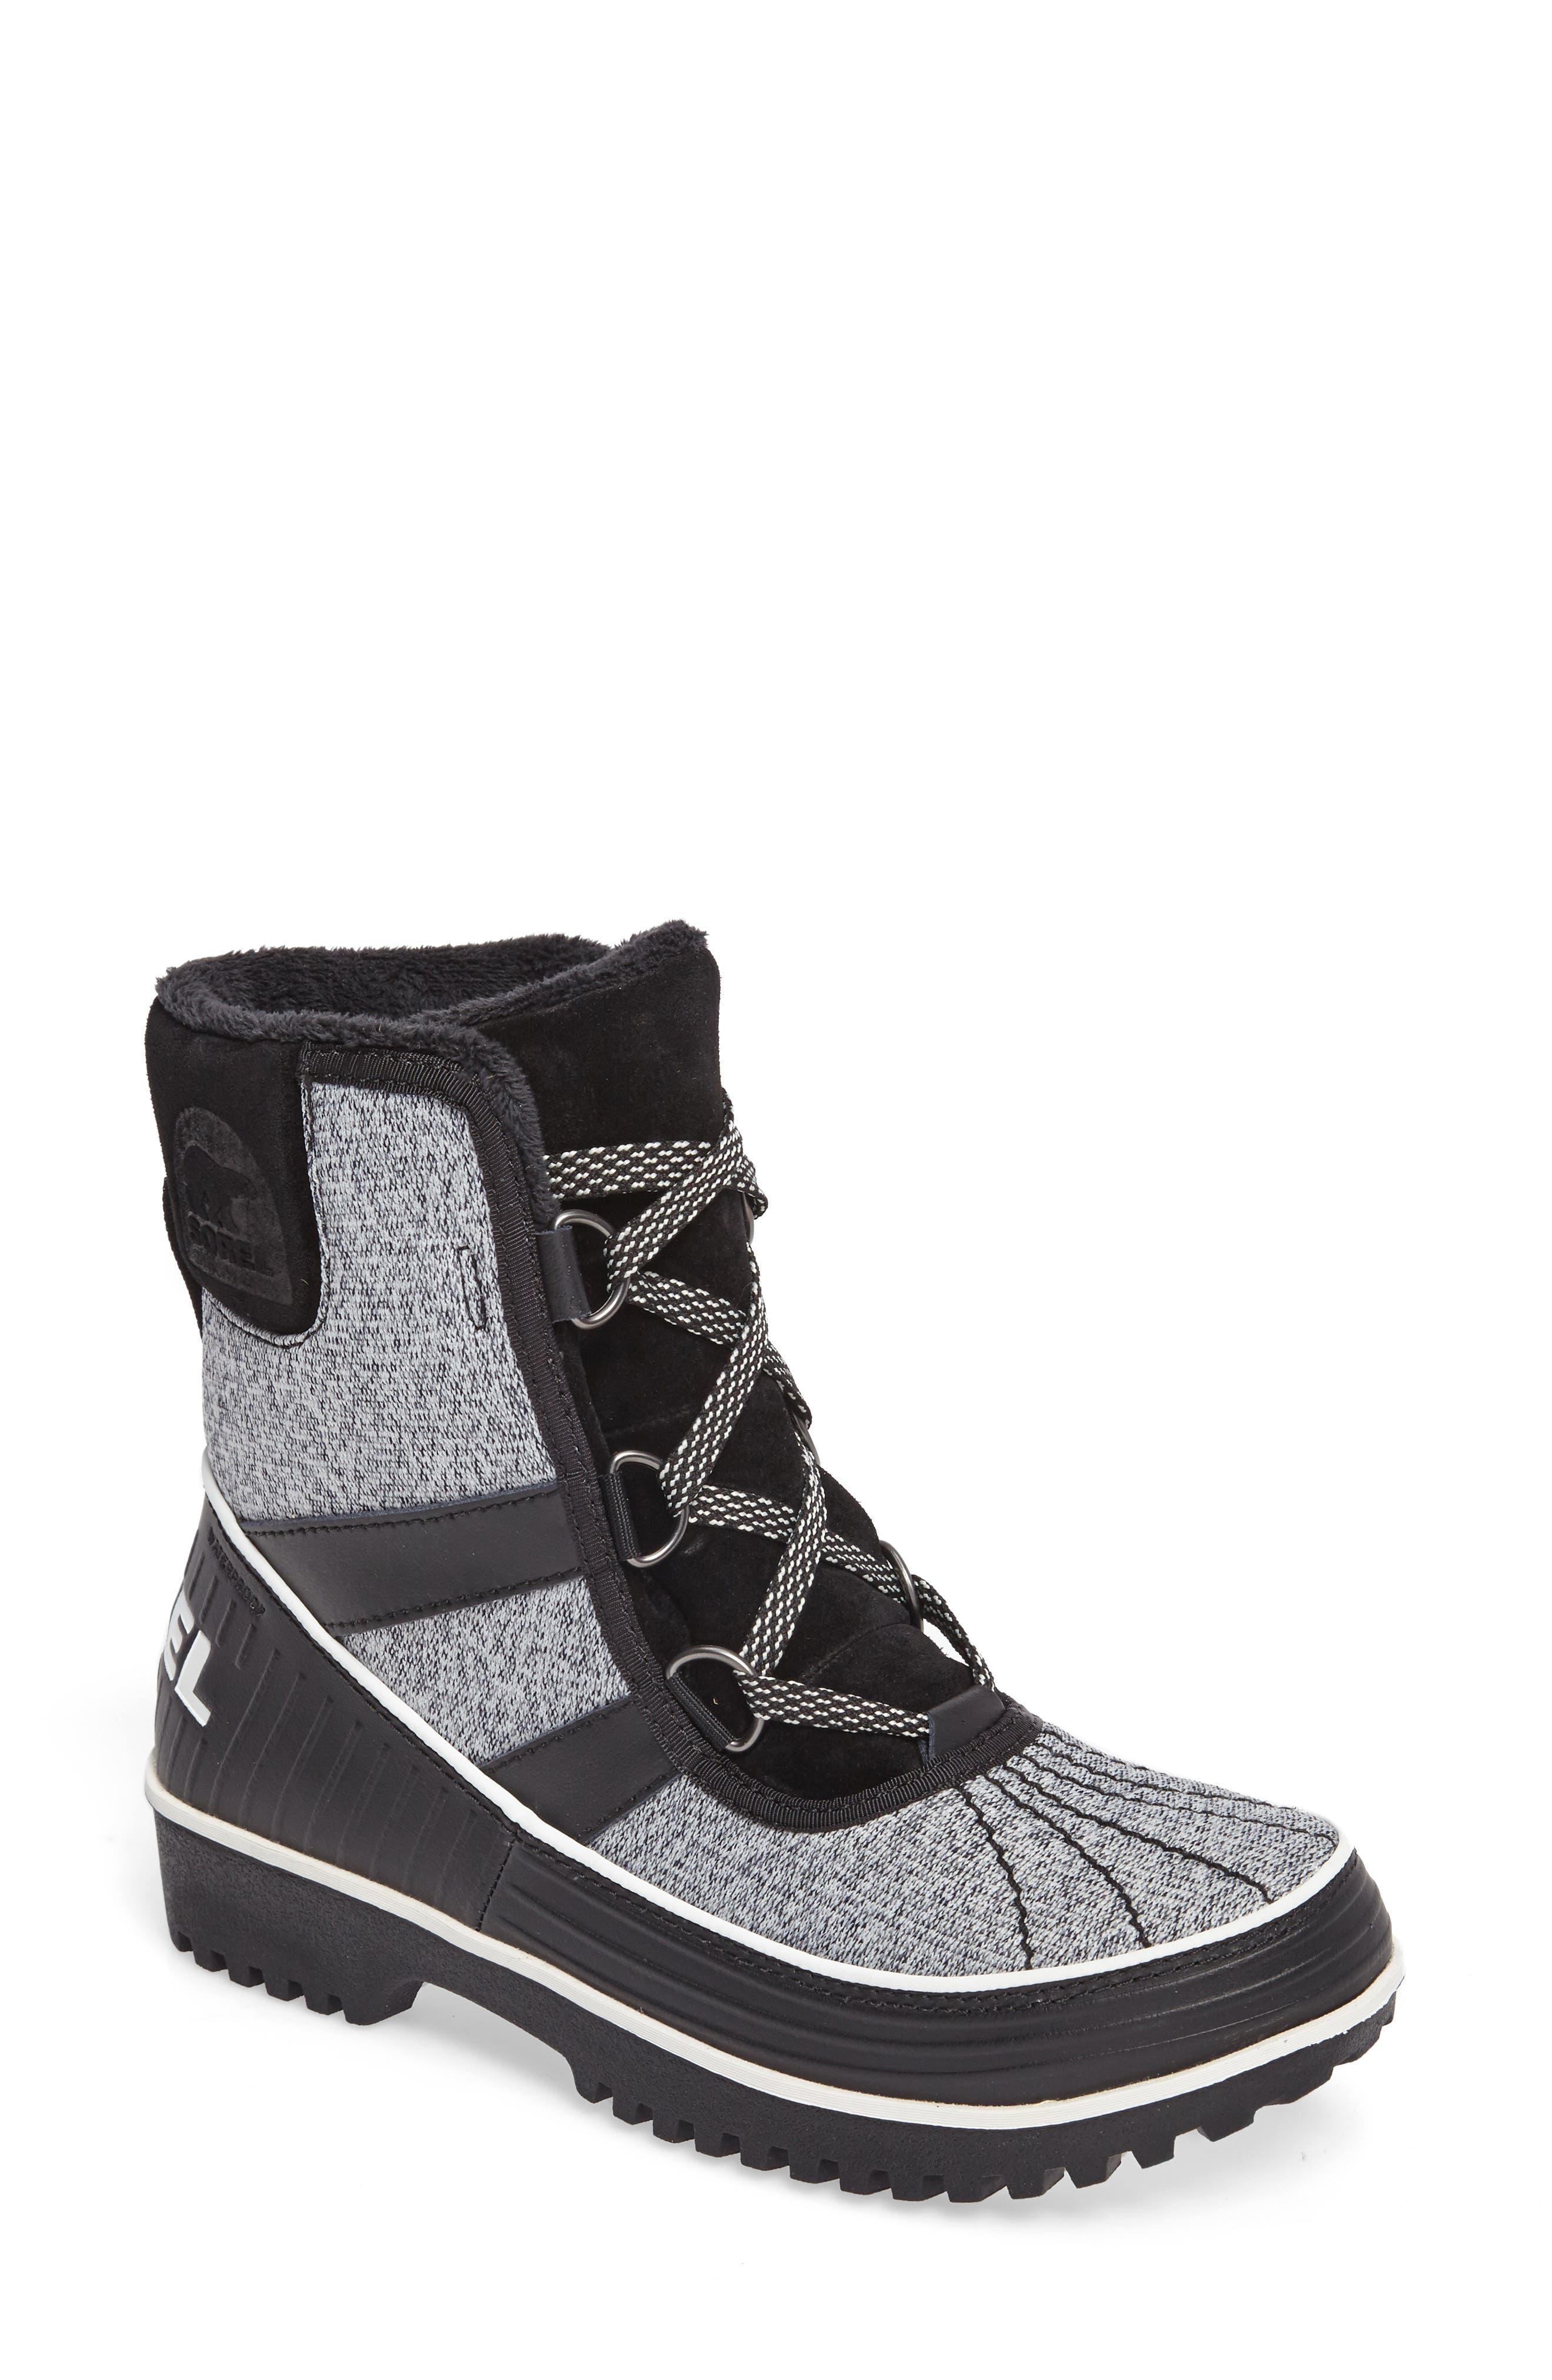 'Tivoli II' Waterproof Boot,                         Main,                         color, 012